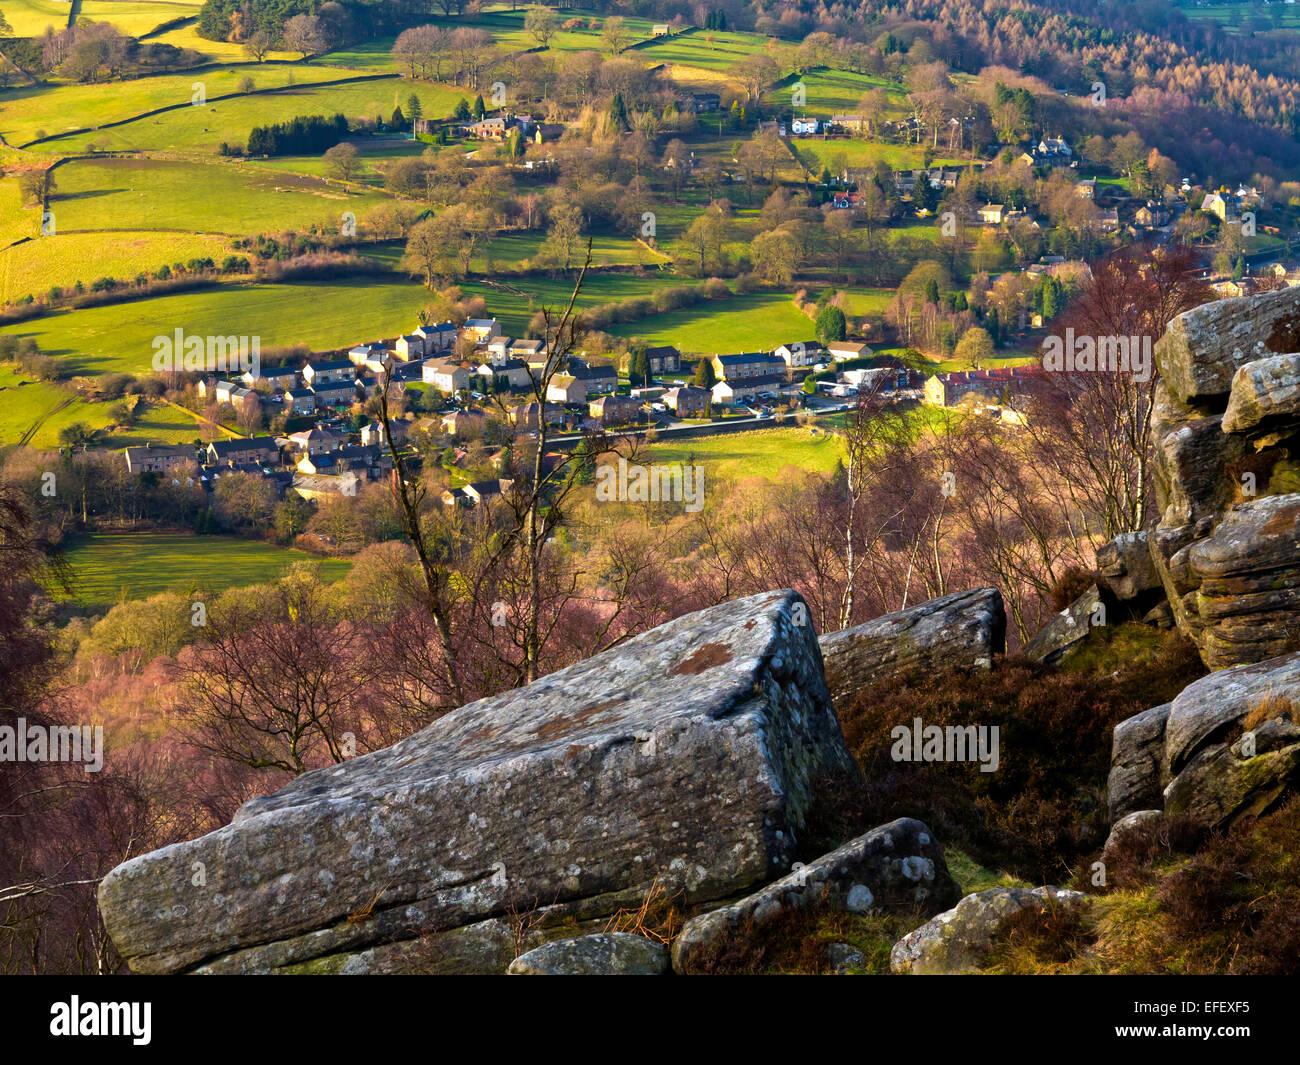 View from Froggatt Edge towards Grindleford village Peak District National Park Derbyshire England UK with rocks - Stock Image